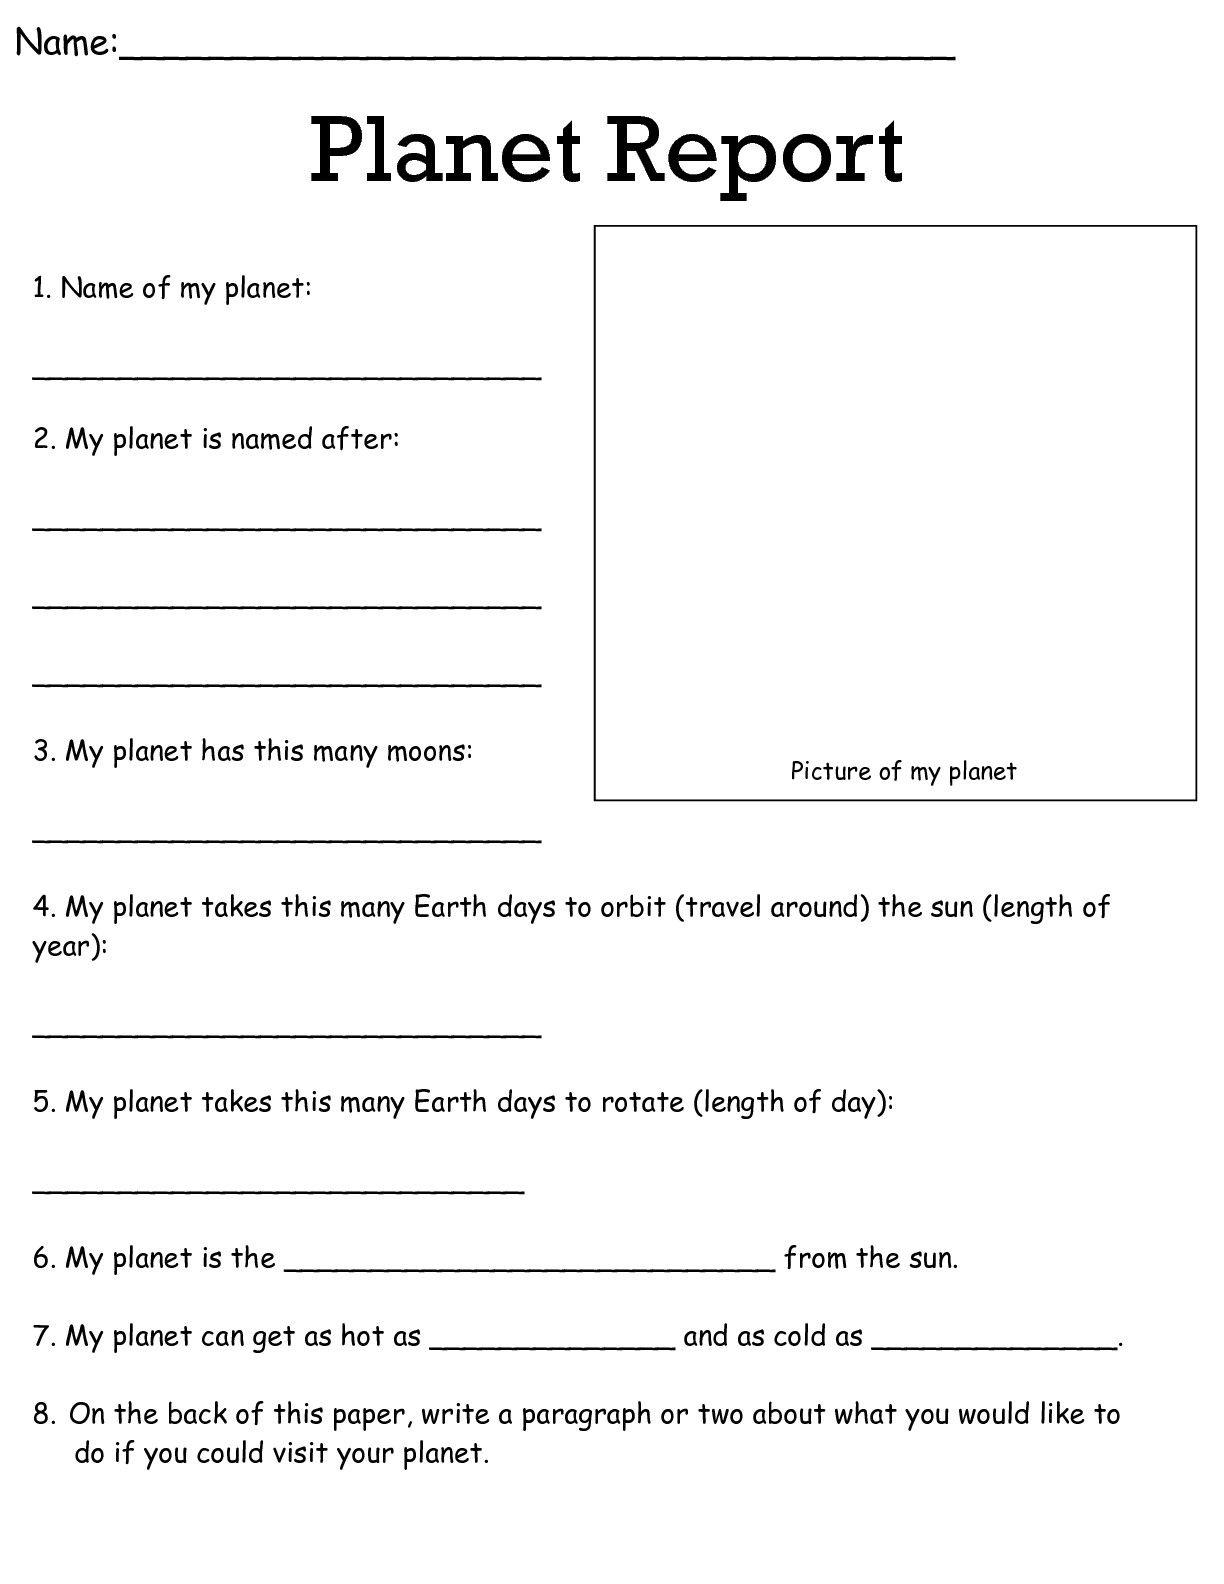 5th Grade Science Worksheets Elegant 5th Grade Scientific